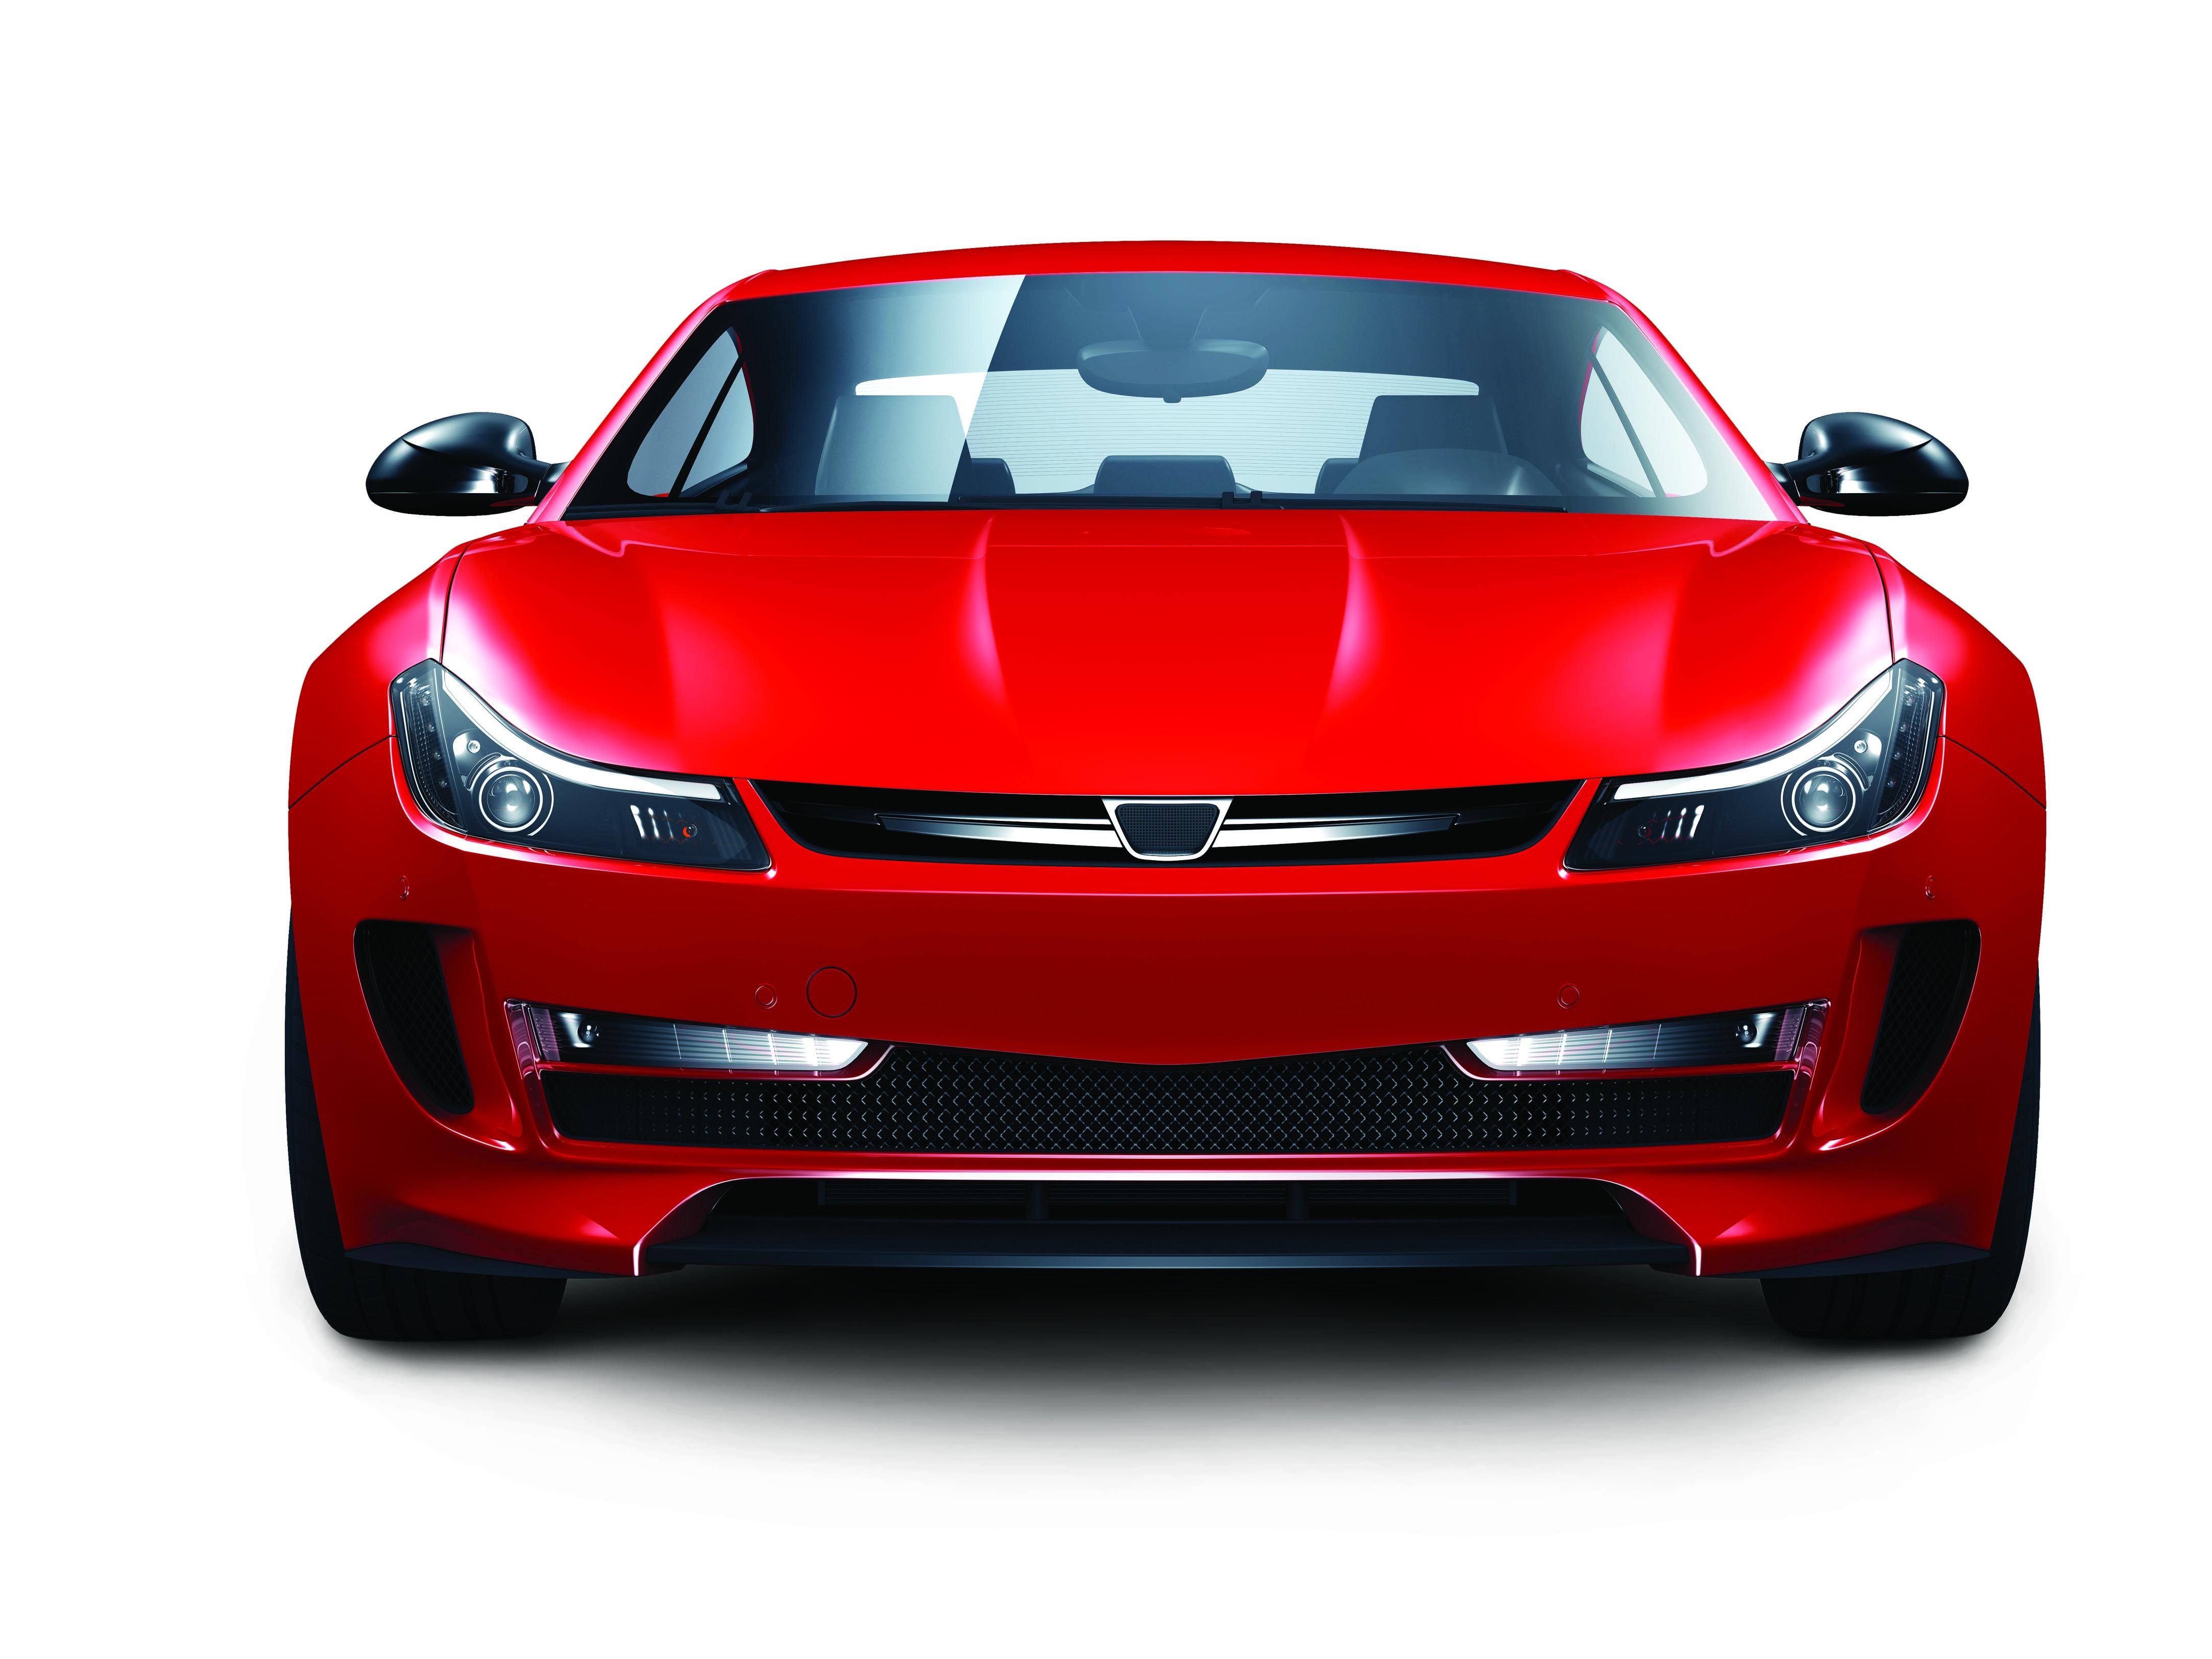 New Car Image